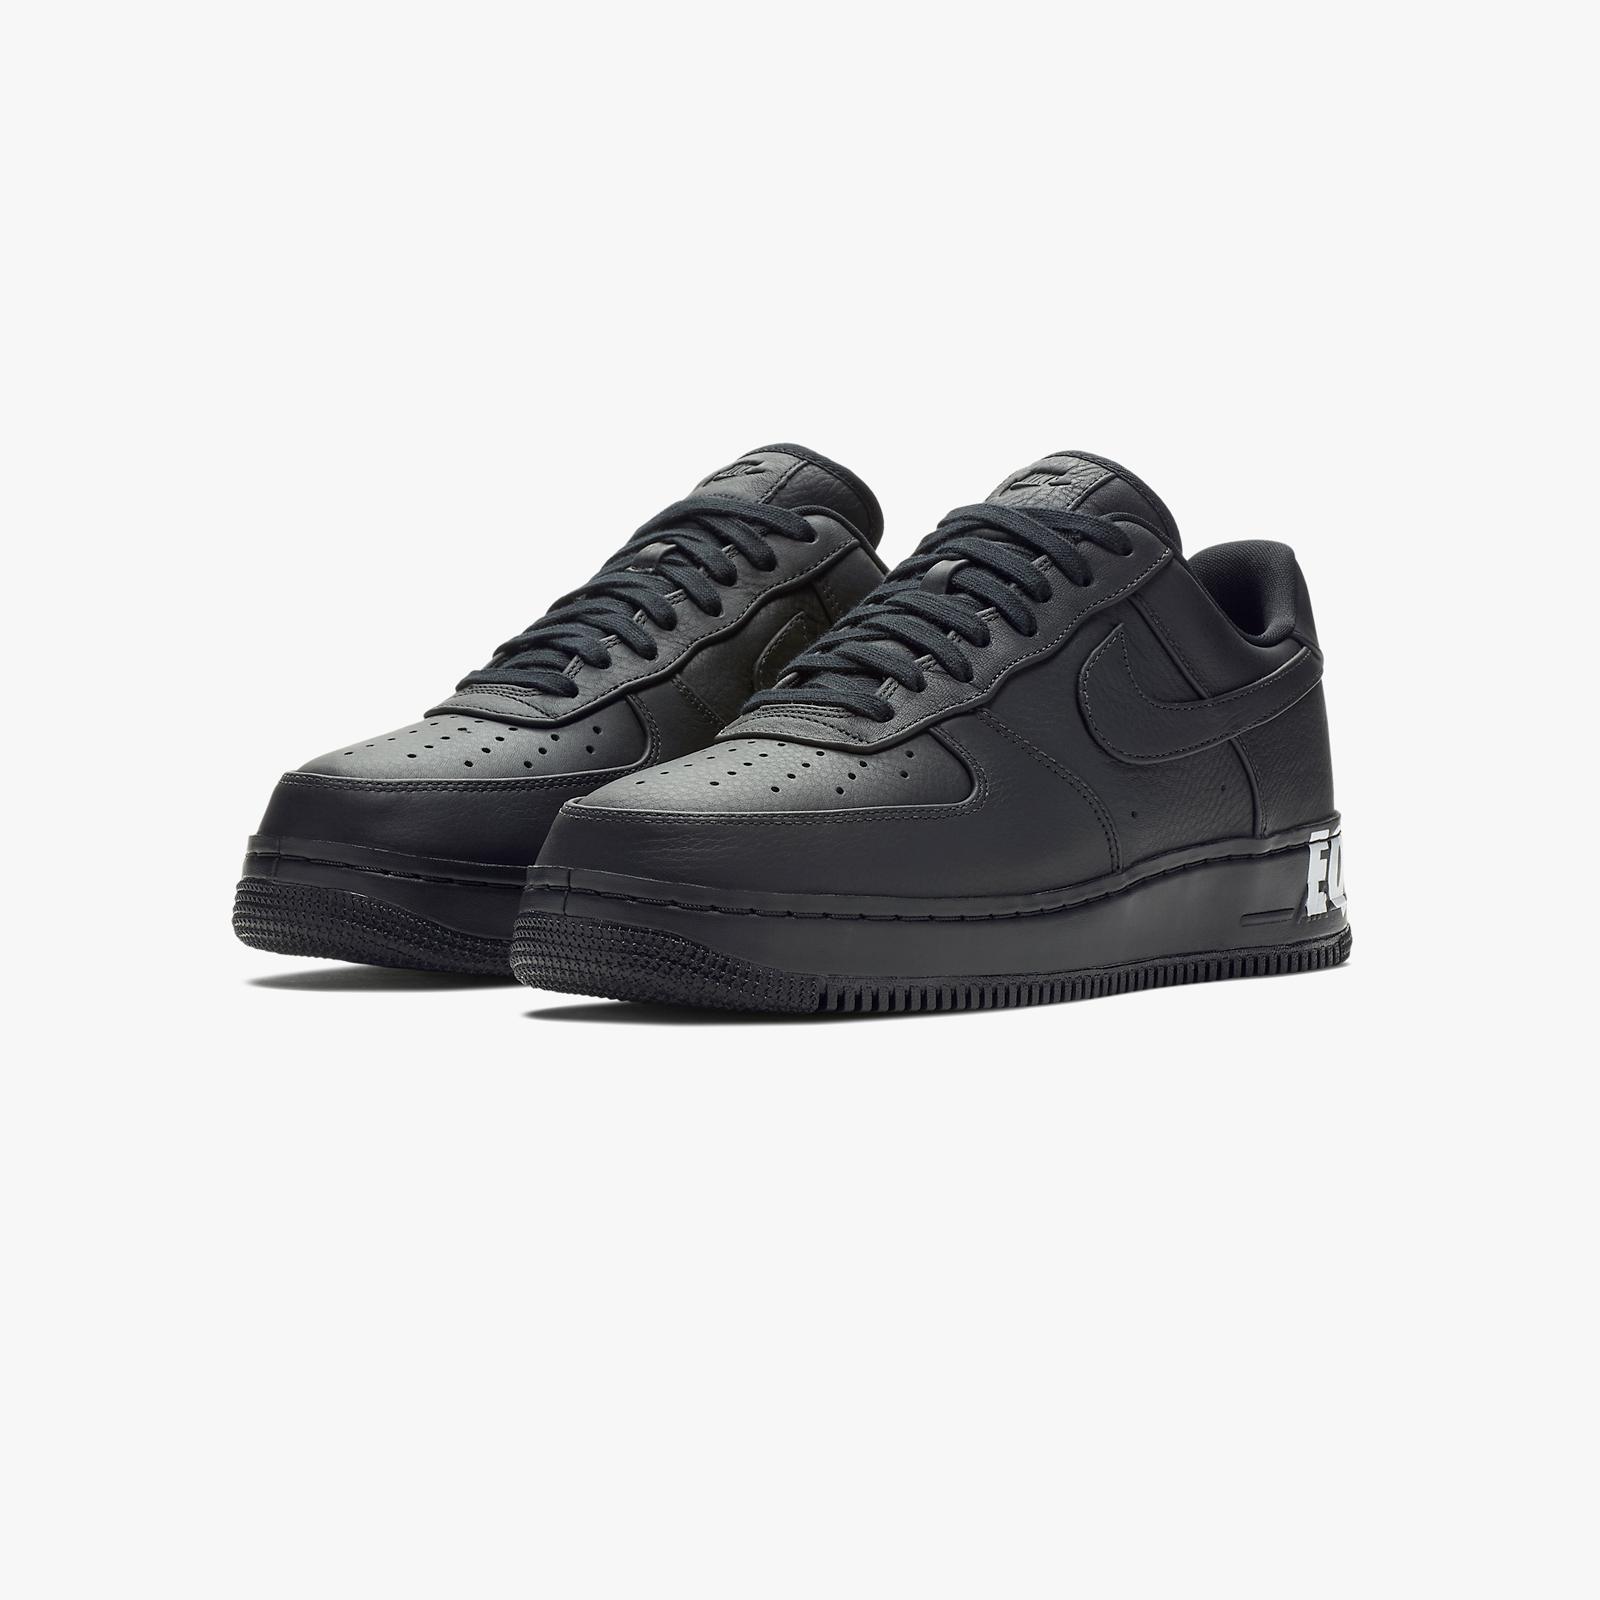 46d1c67ef15 Nike Air Force 1 CMFT Equality - Aq2125-001 - Sneakersnstuff ...